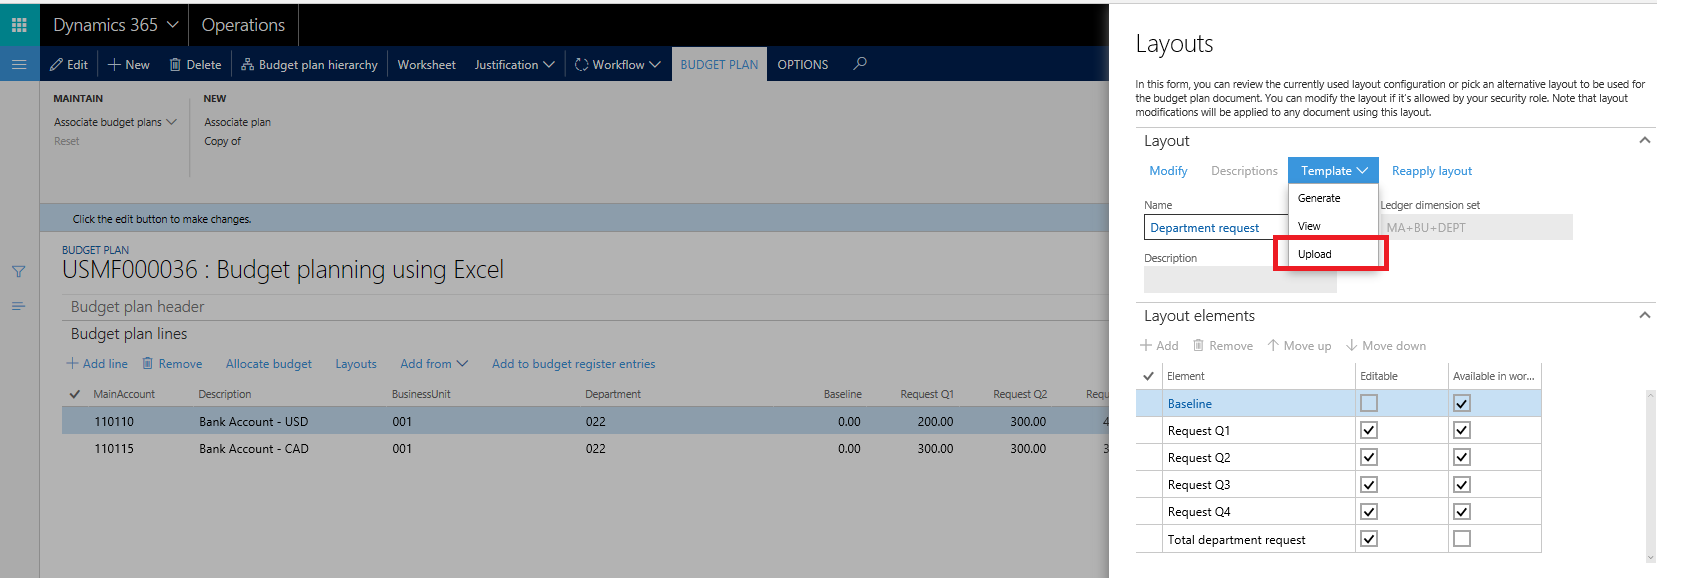 Sablony Planovani Rozpoctu Pro Excel Finance Operations